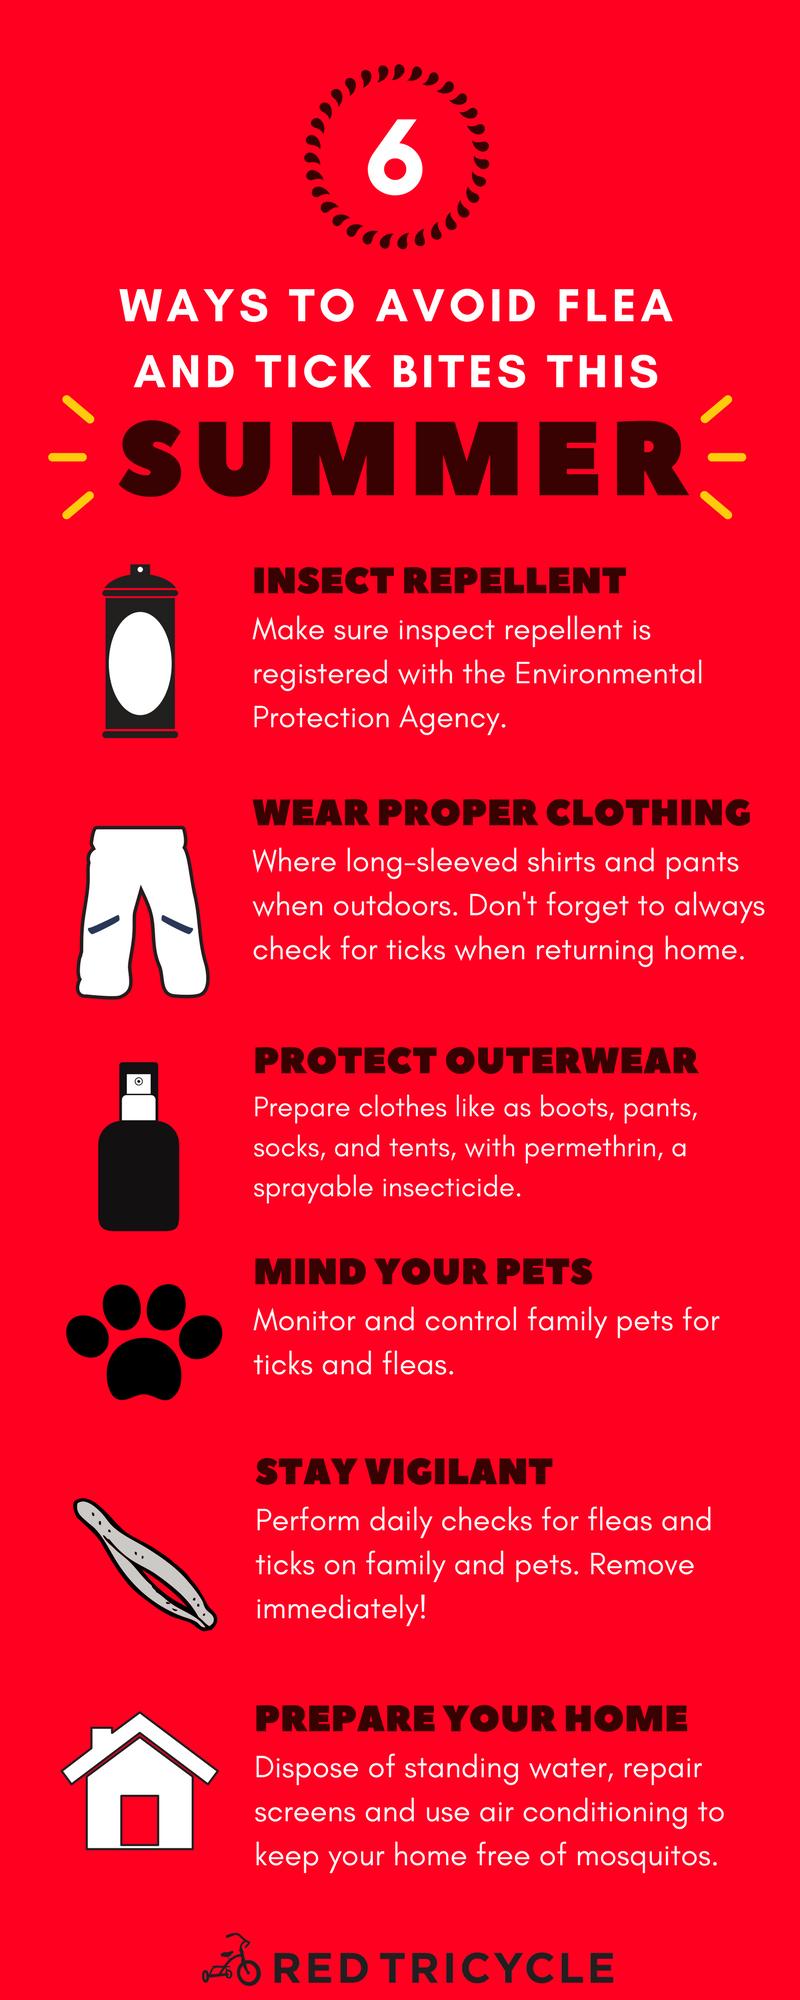 6 ways to avoid flea and tick bites this summer